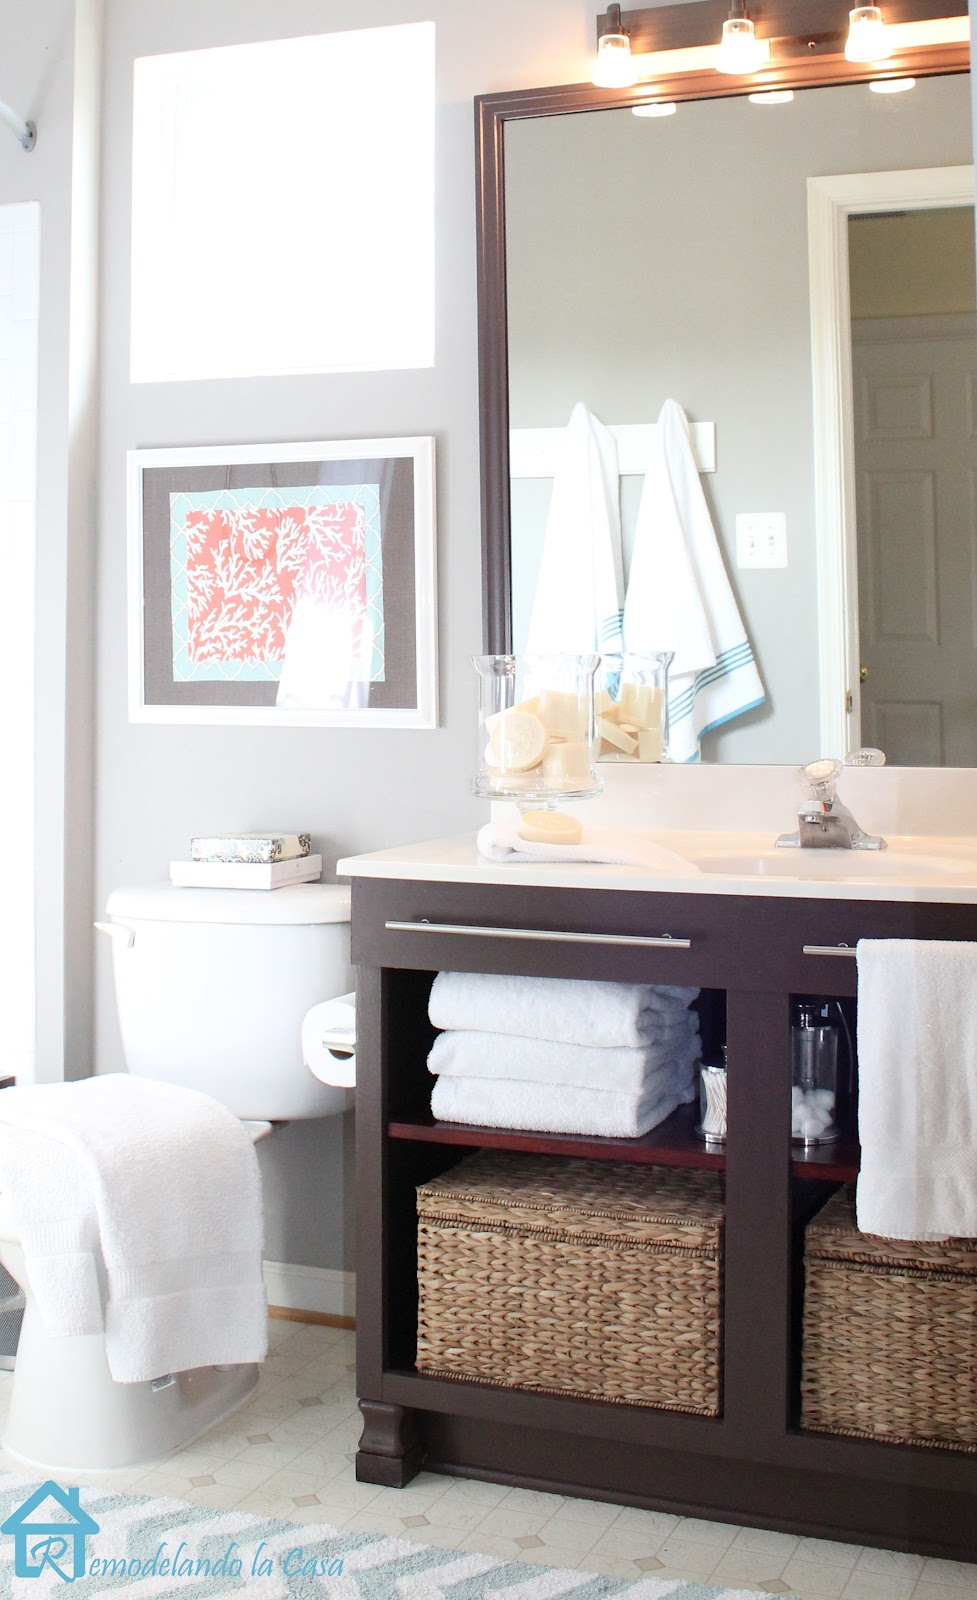 1.builders grade vanity revamp by Simphome.com